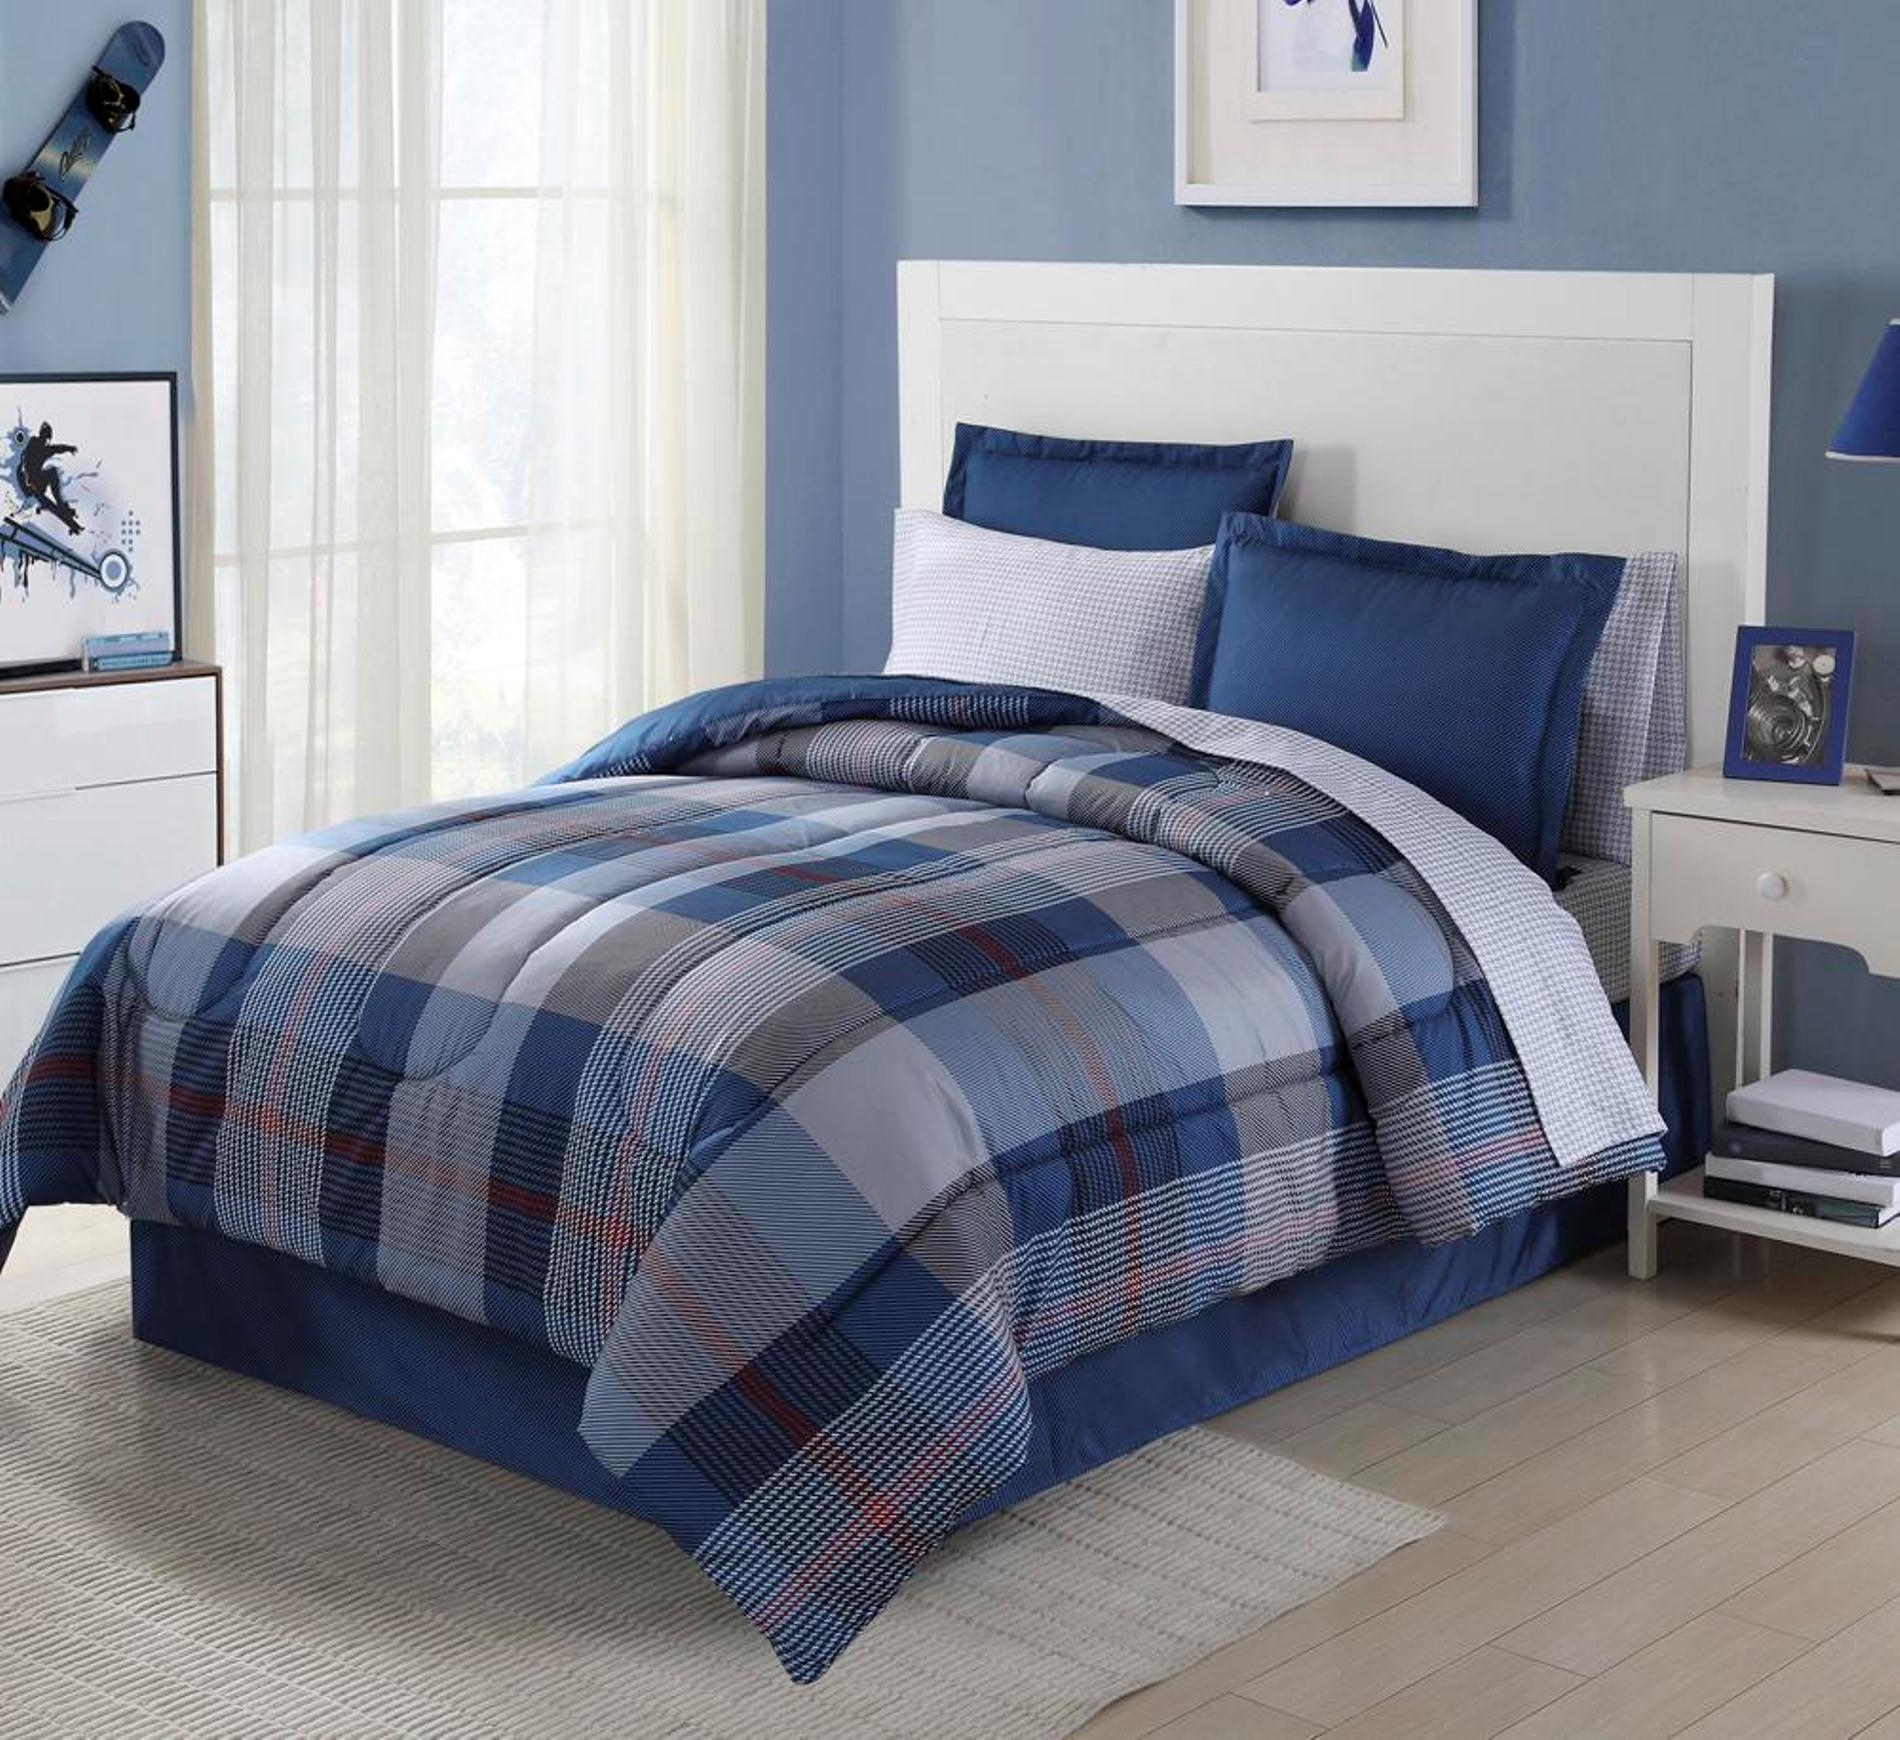 Essential Home 8 Piece Complete Bed Set Blue Plaid